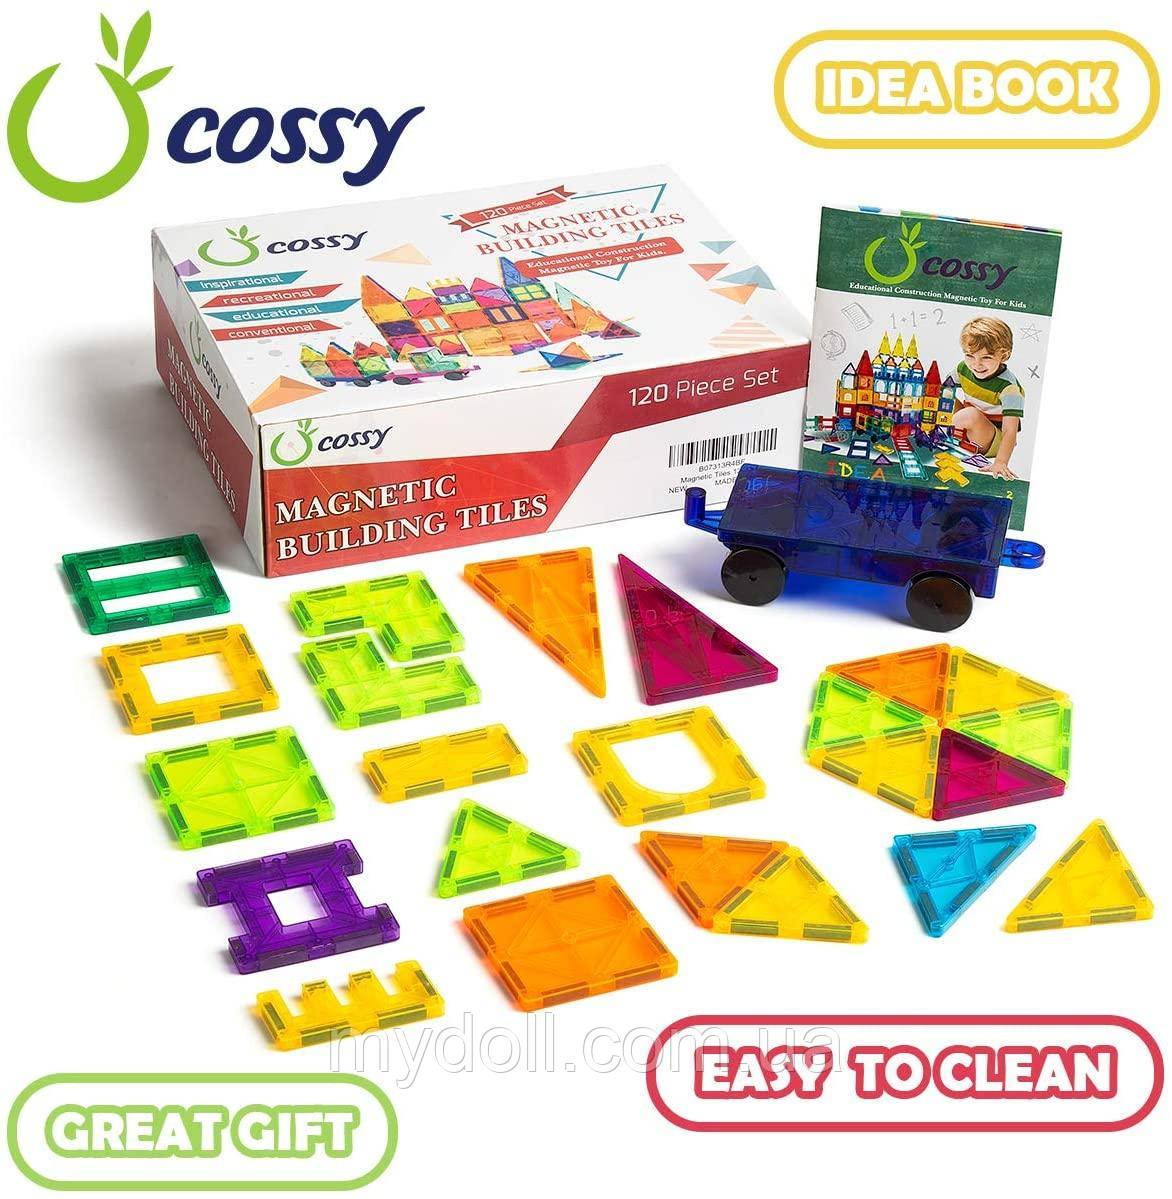 Магнитный конструктор cossy Kids Magnet Toys Magnetic Tiles, 120 PCs Magnetic Building Blocks with 2 Car